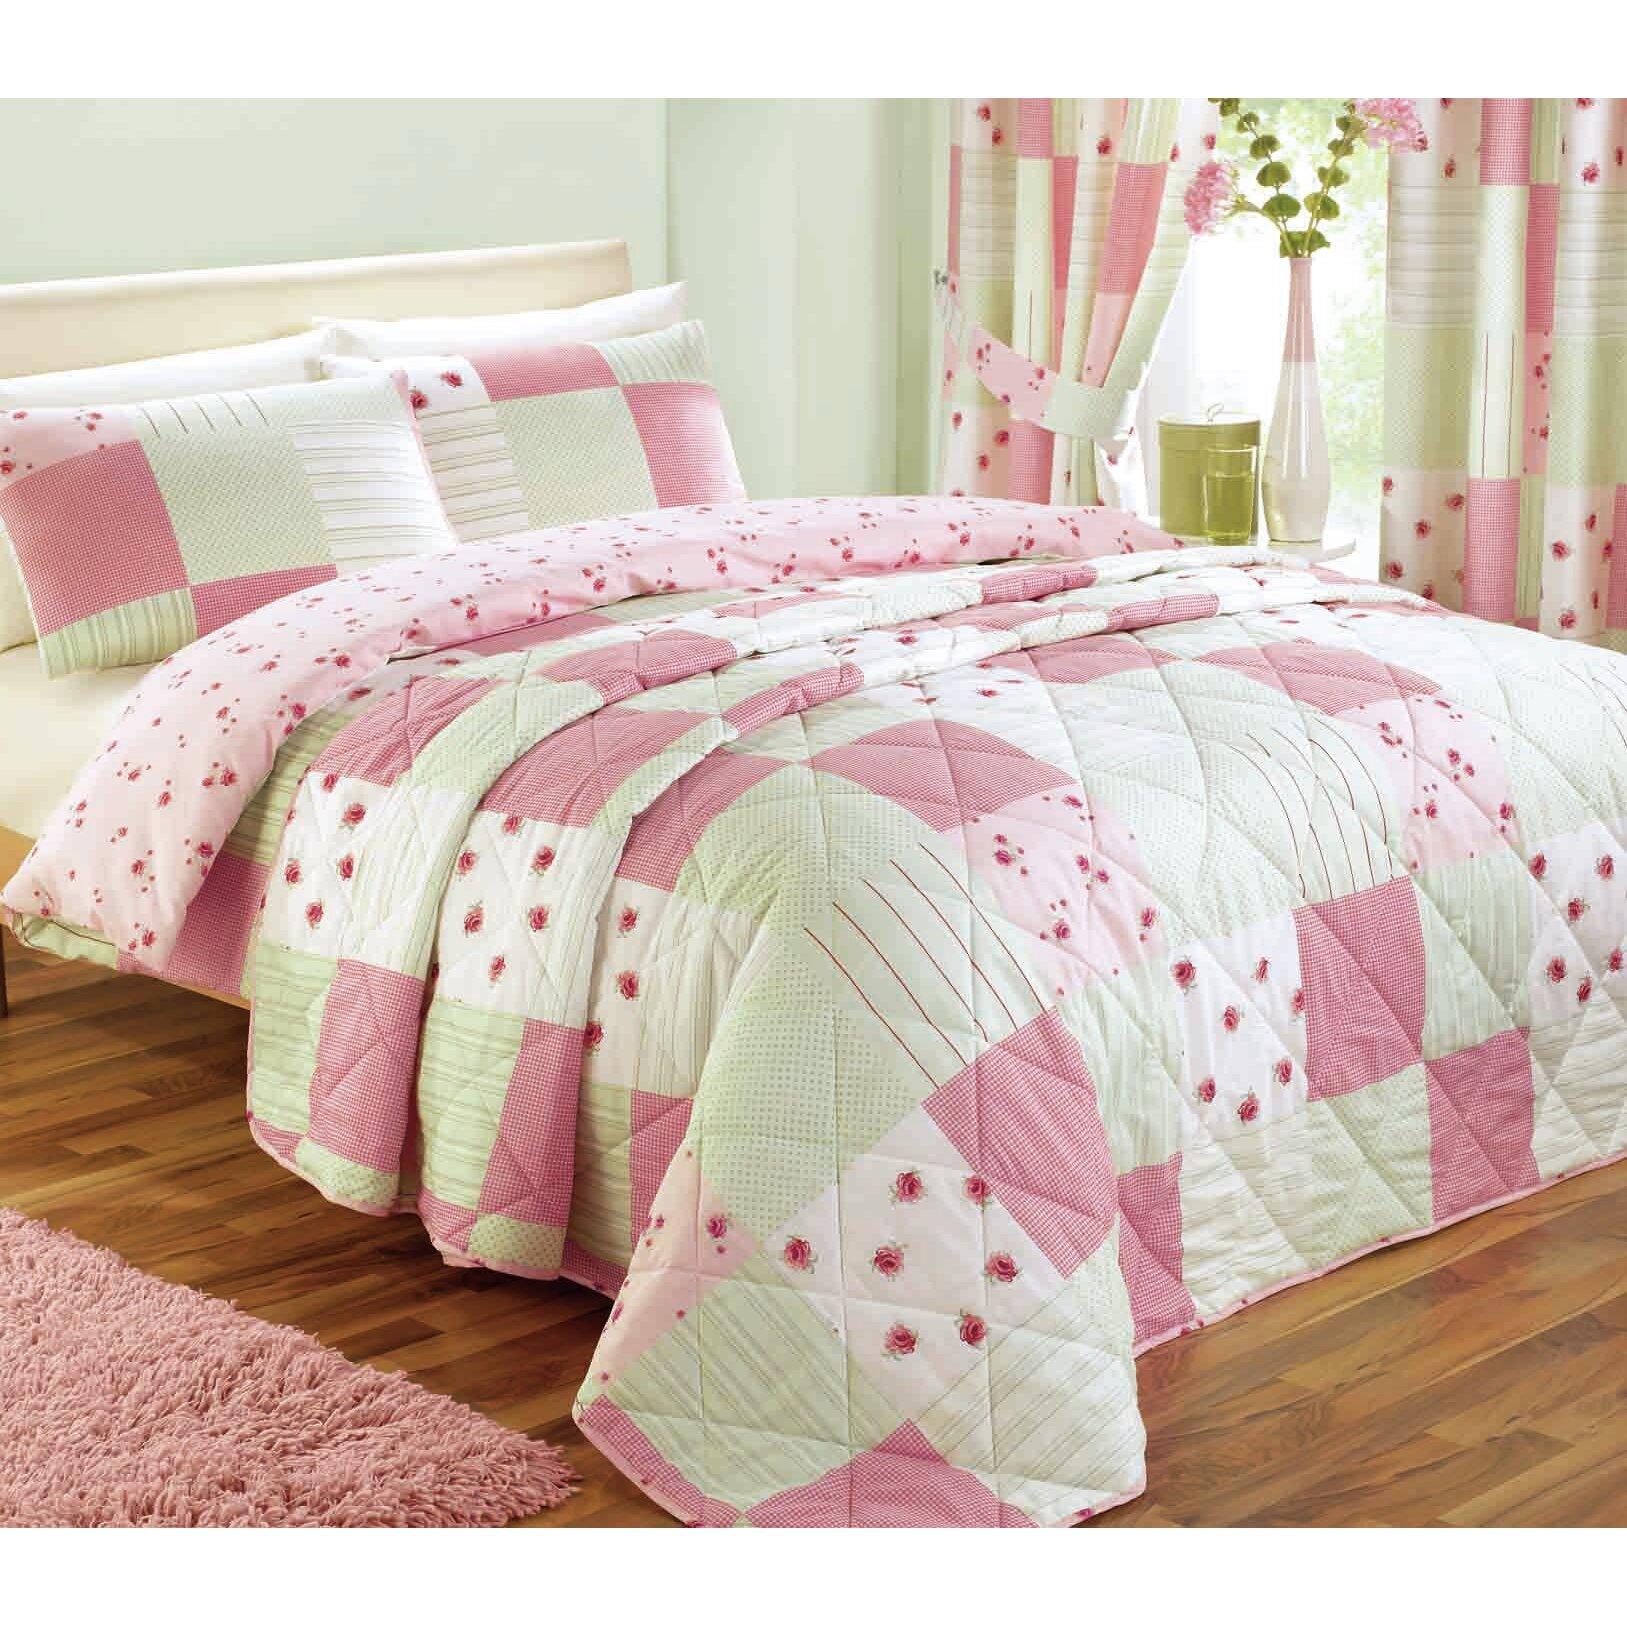 Dreams n drapes patchwork bedspread